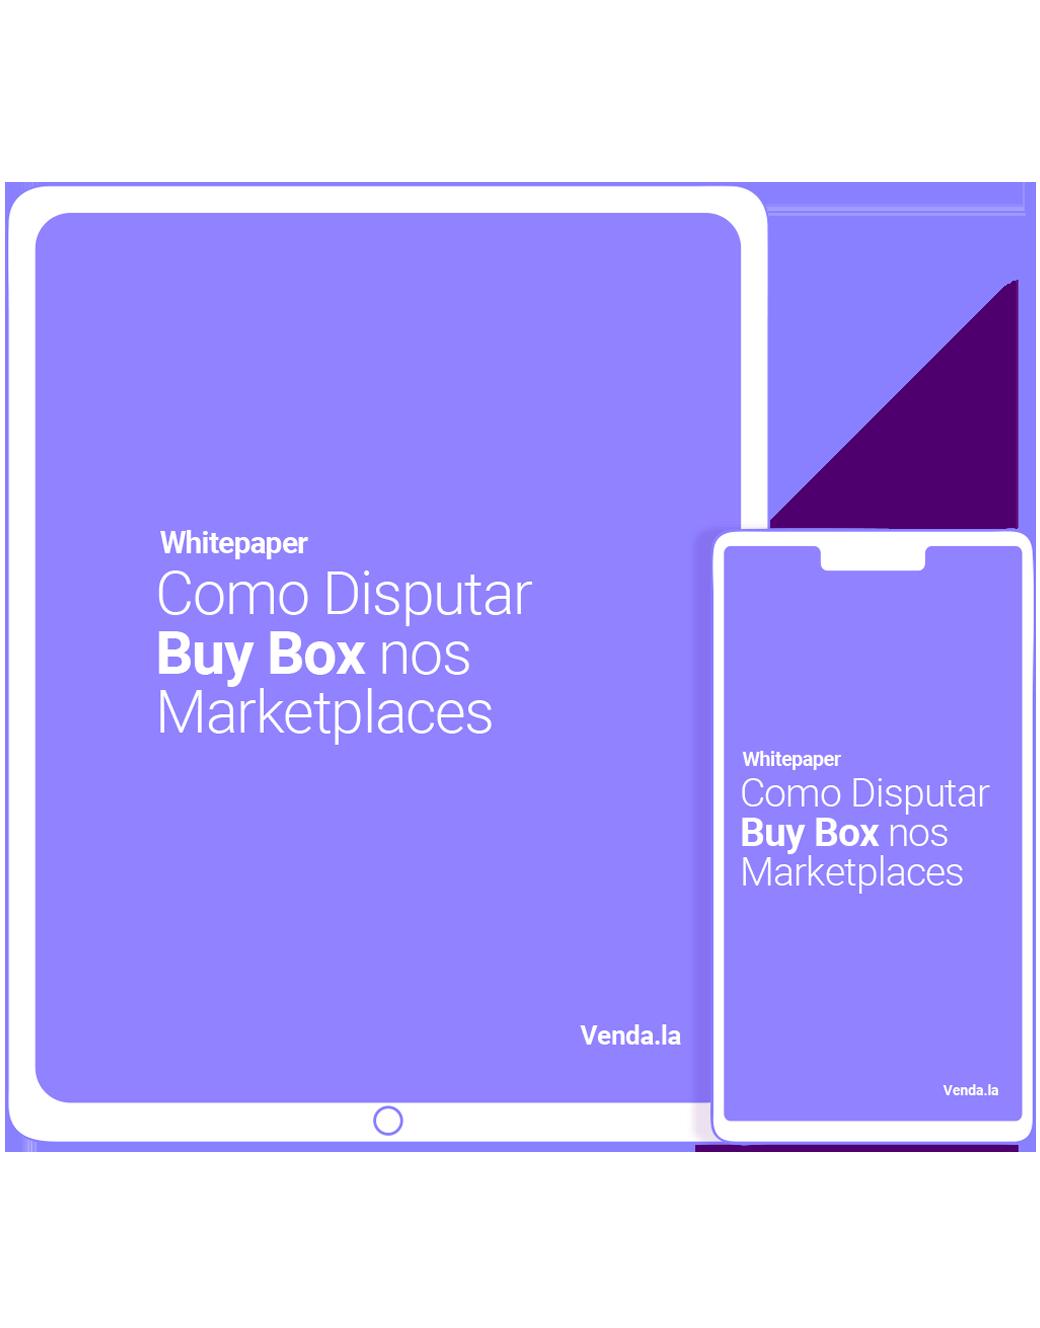 Como disputar Buy Box nos marketplaces